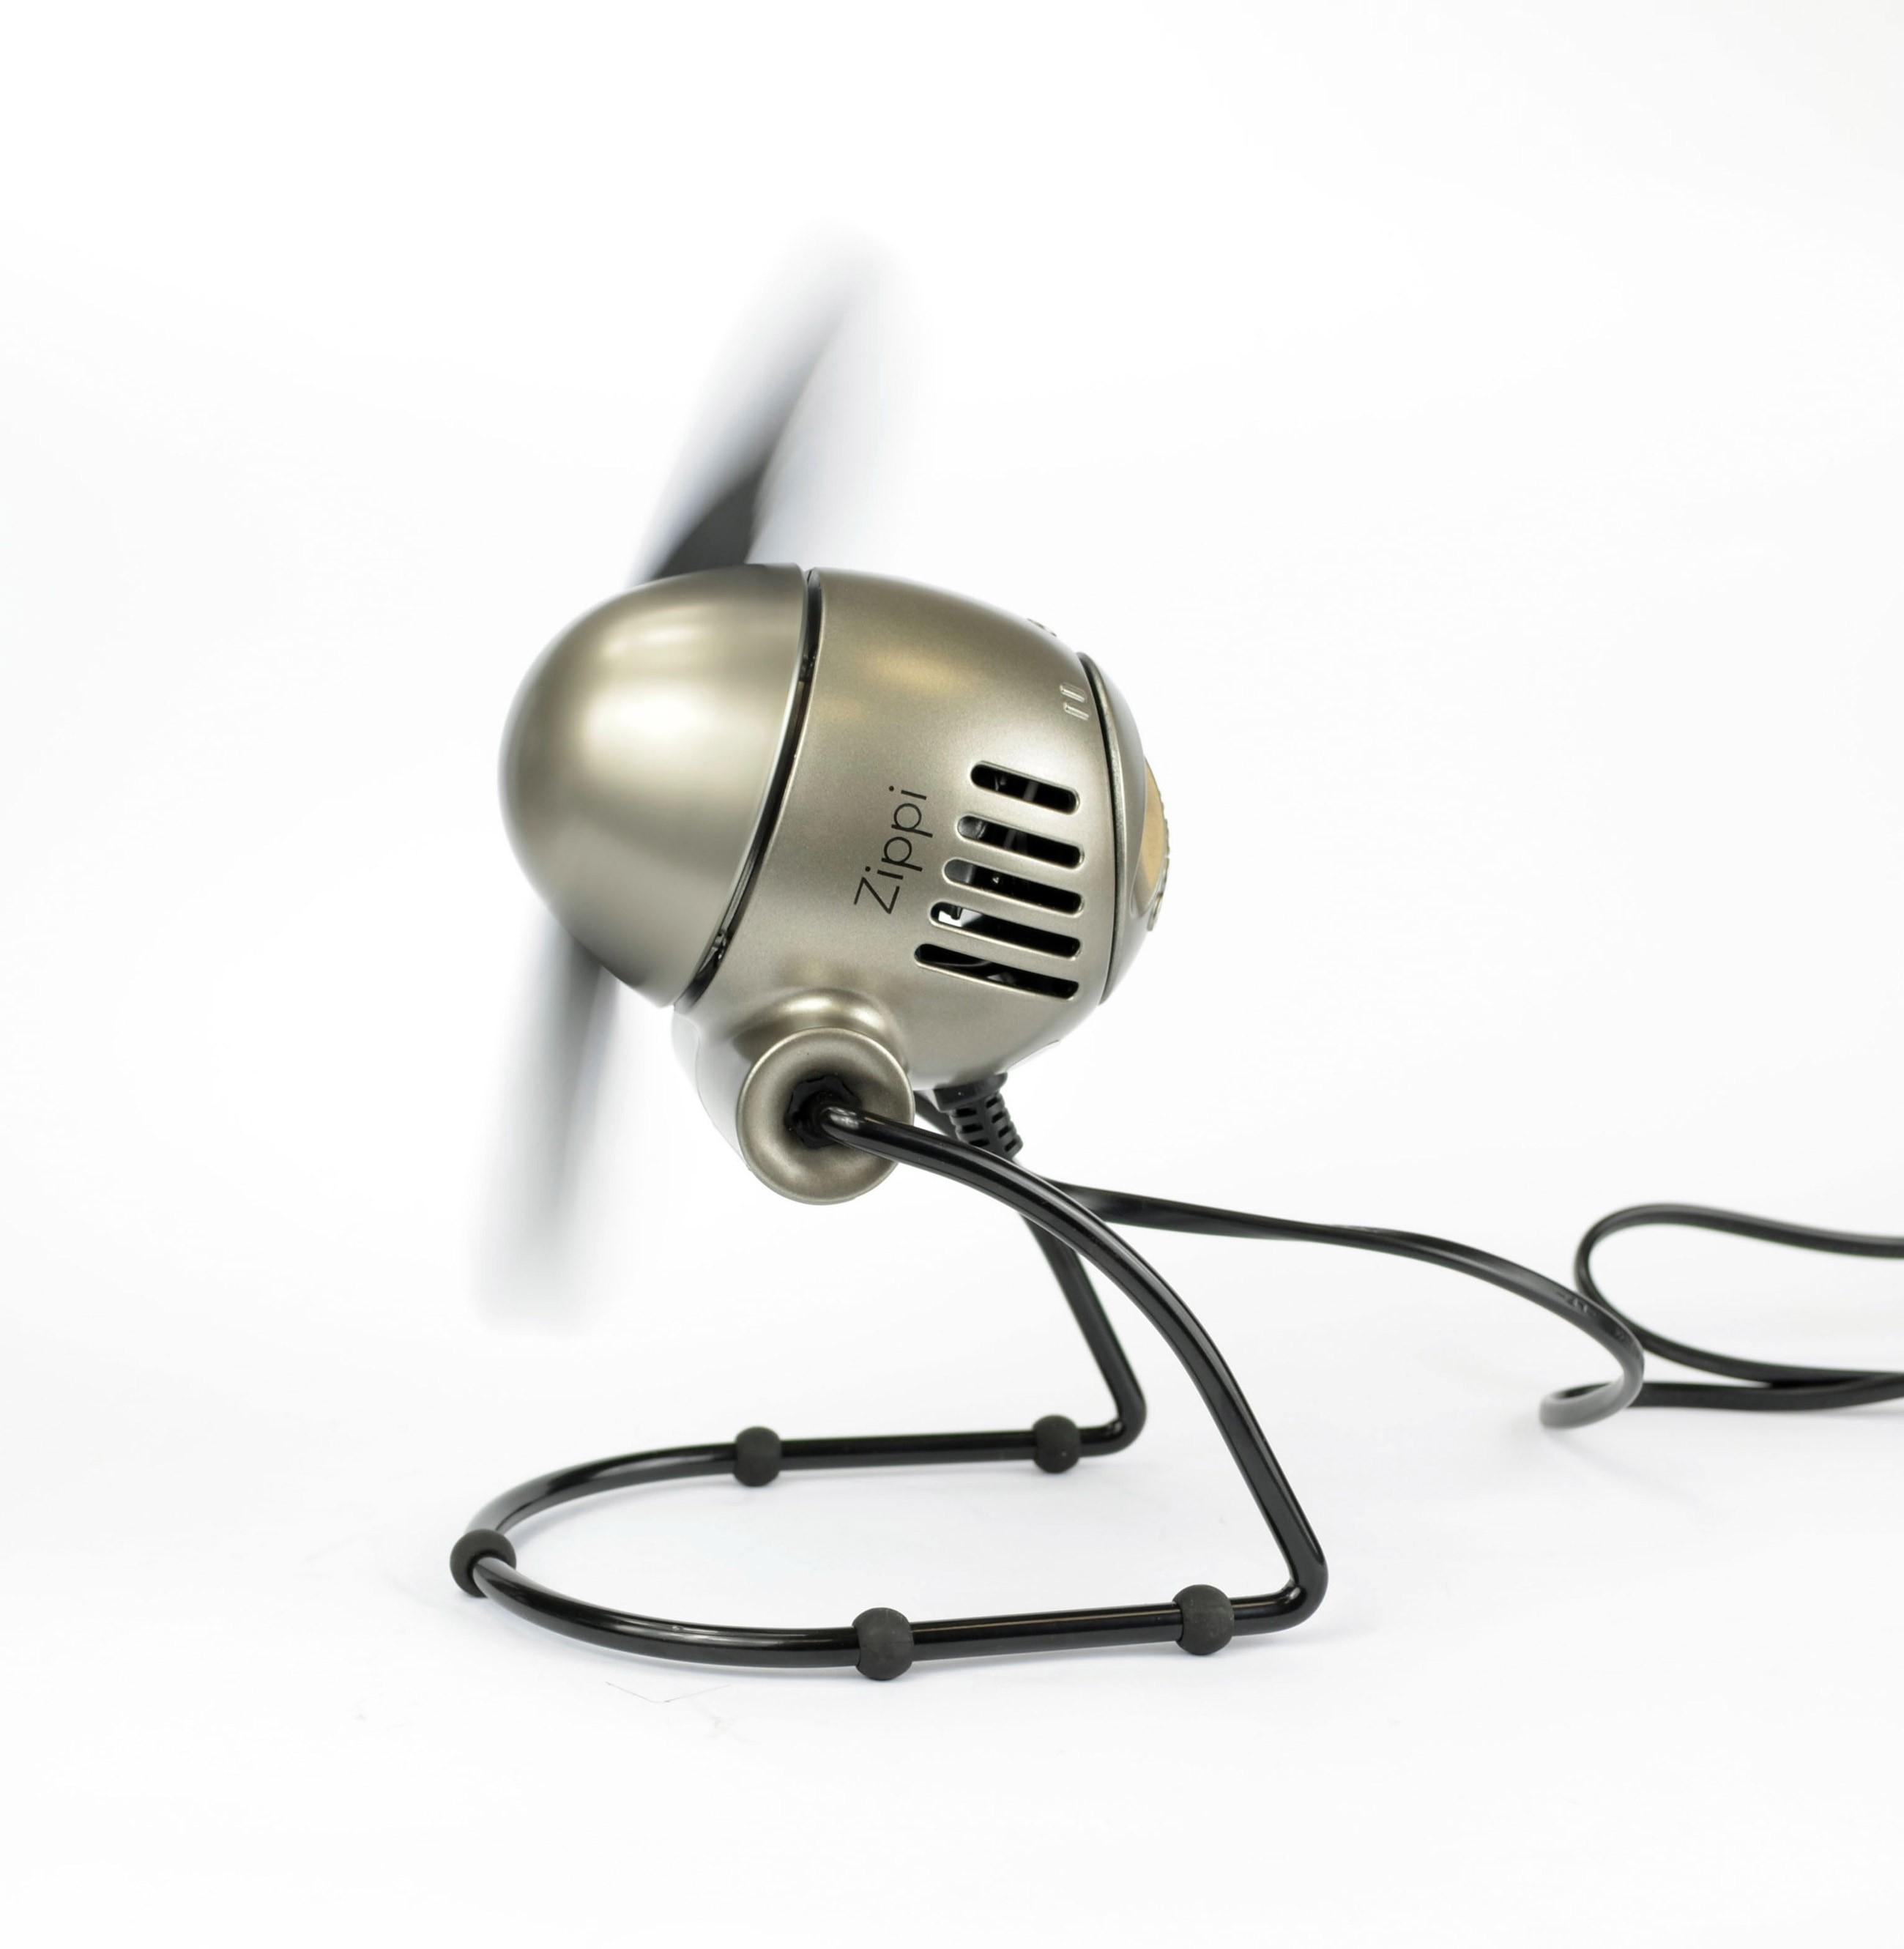 Ventilator / Tischventilator Vornado Zippi klappbar silber Ø 18,8cm Bild 2